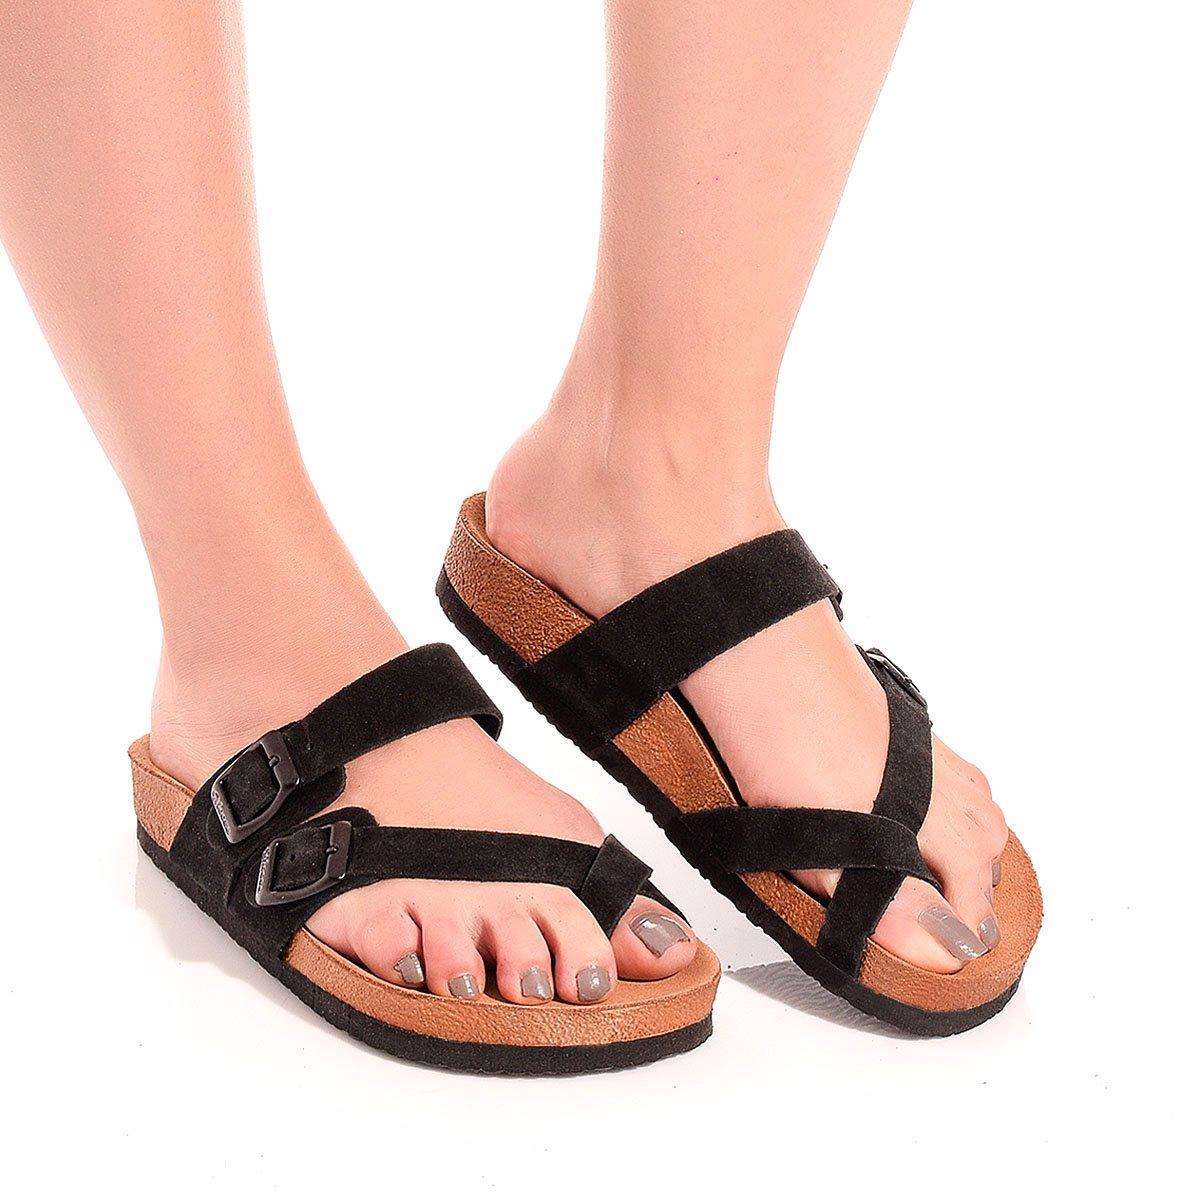 b0f0dd184a4f https   www.buyinvite.com.au product Hira-Leather-SandalDonald ...